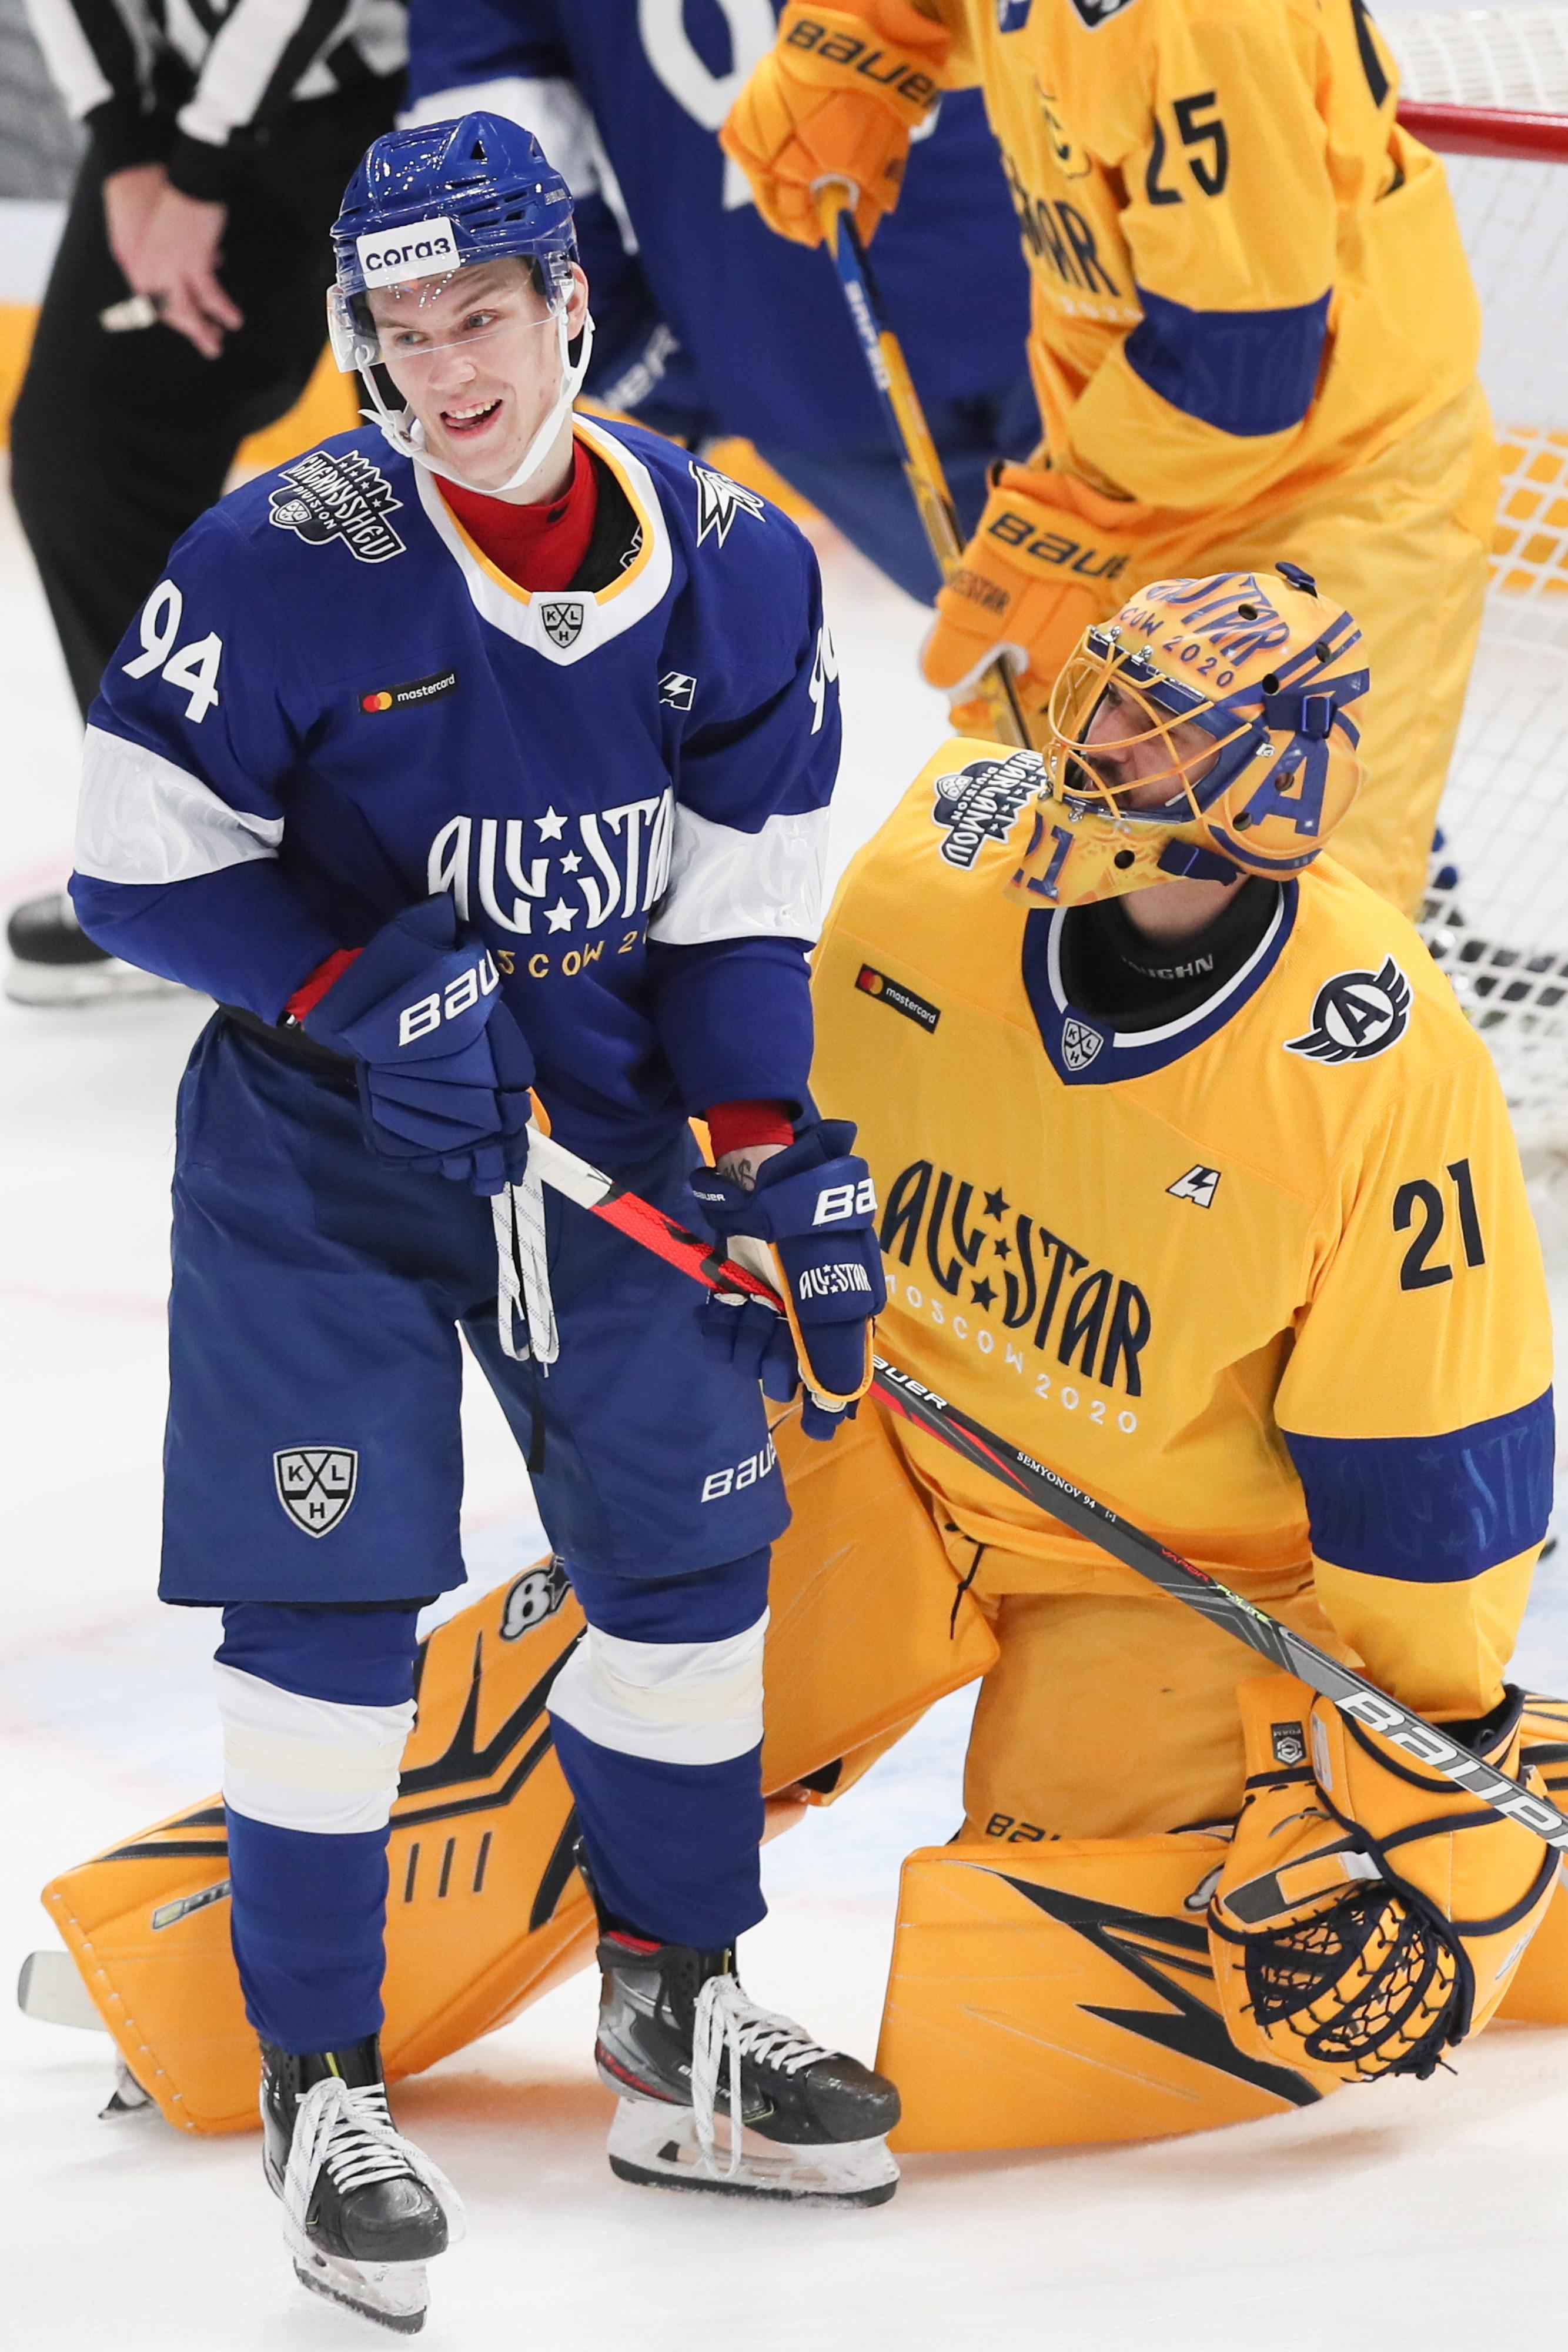 2020 Kontinental Hockey League All-Star Game Tournament